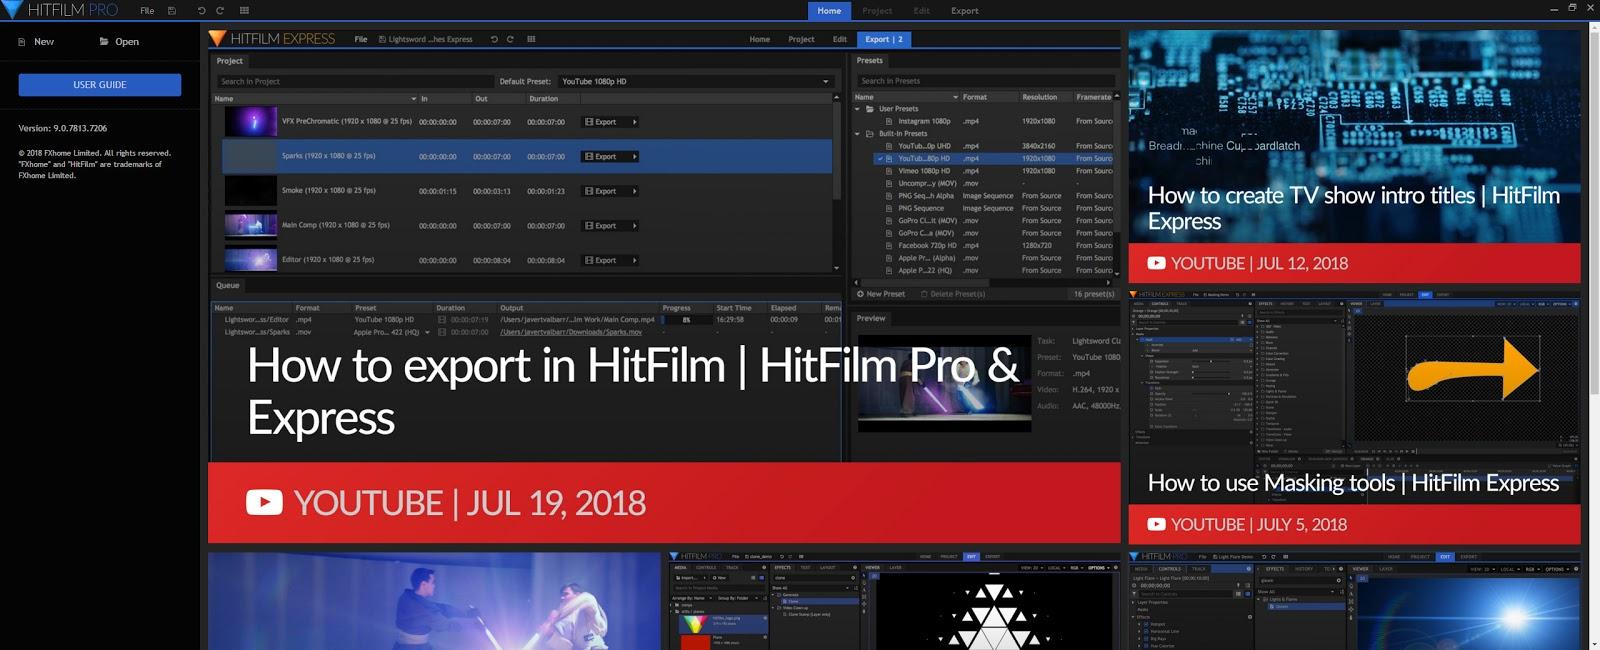 HitFilm Pro v11.0.8319.47197 Full version